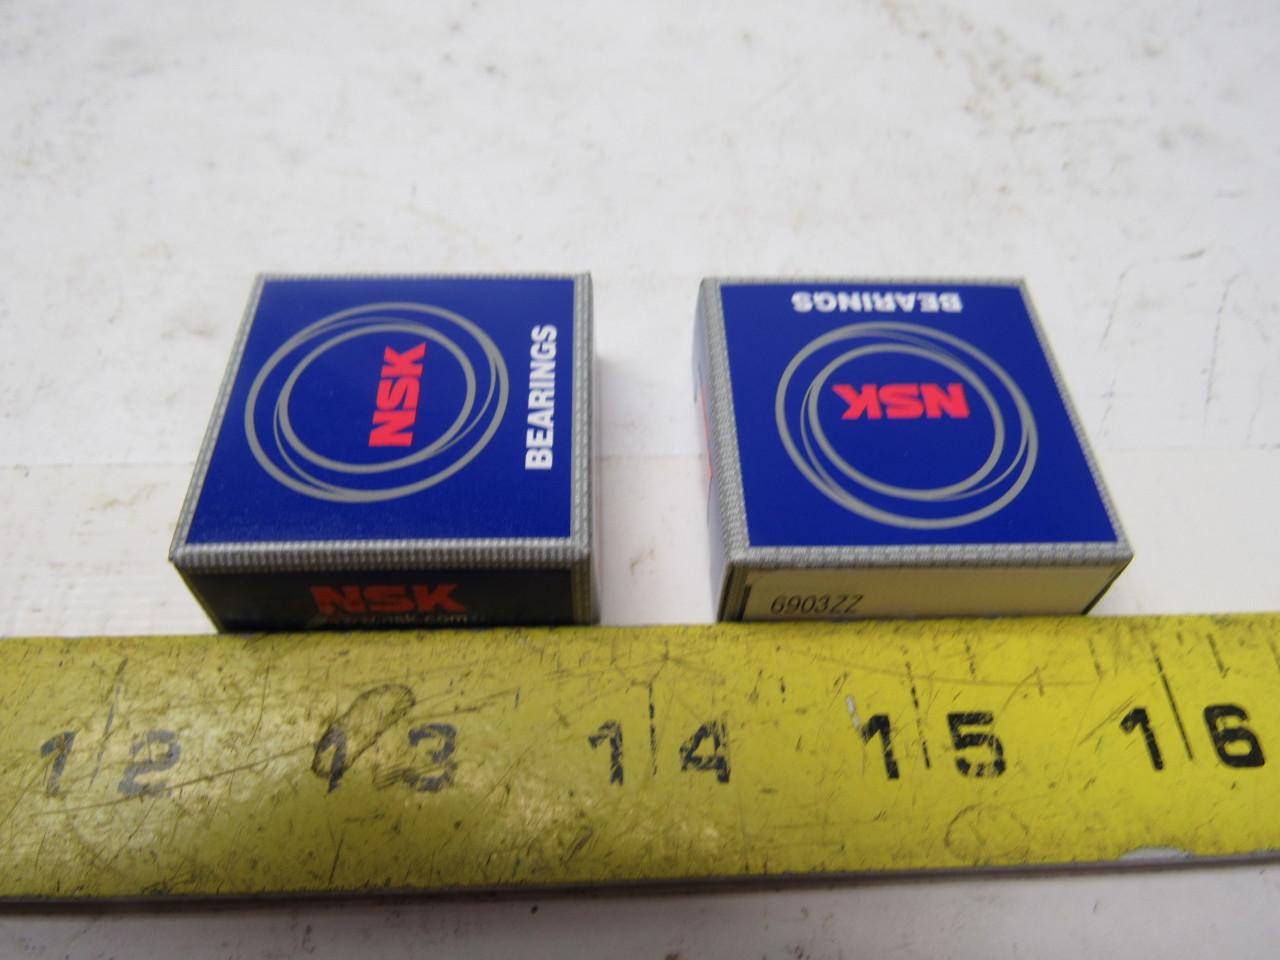 NSK 6903zz Metal Shielded Single Row Ball Bearing Lot of 2